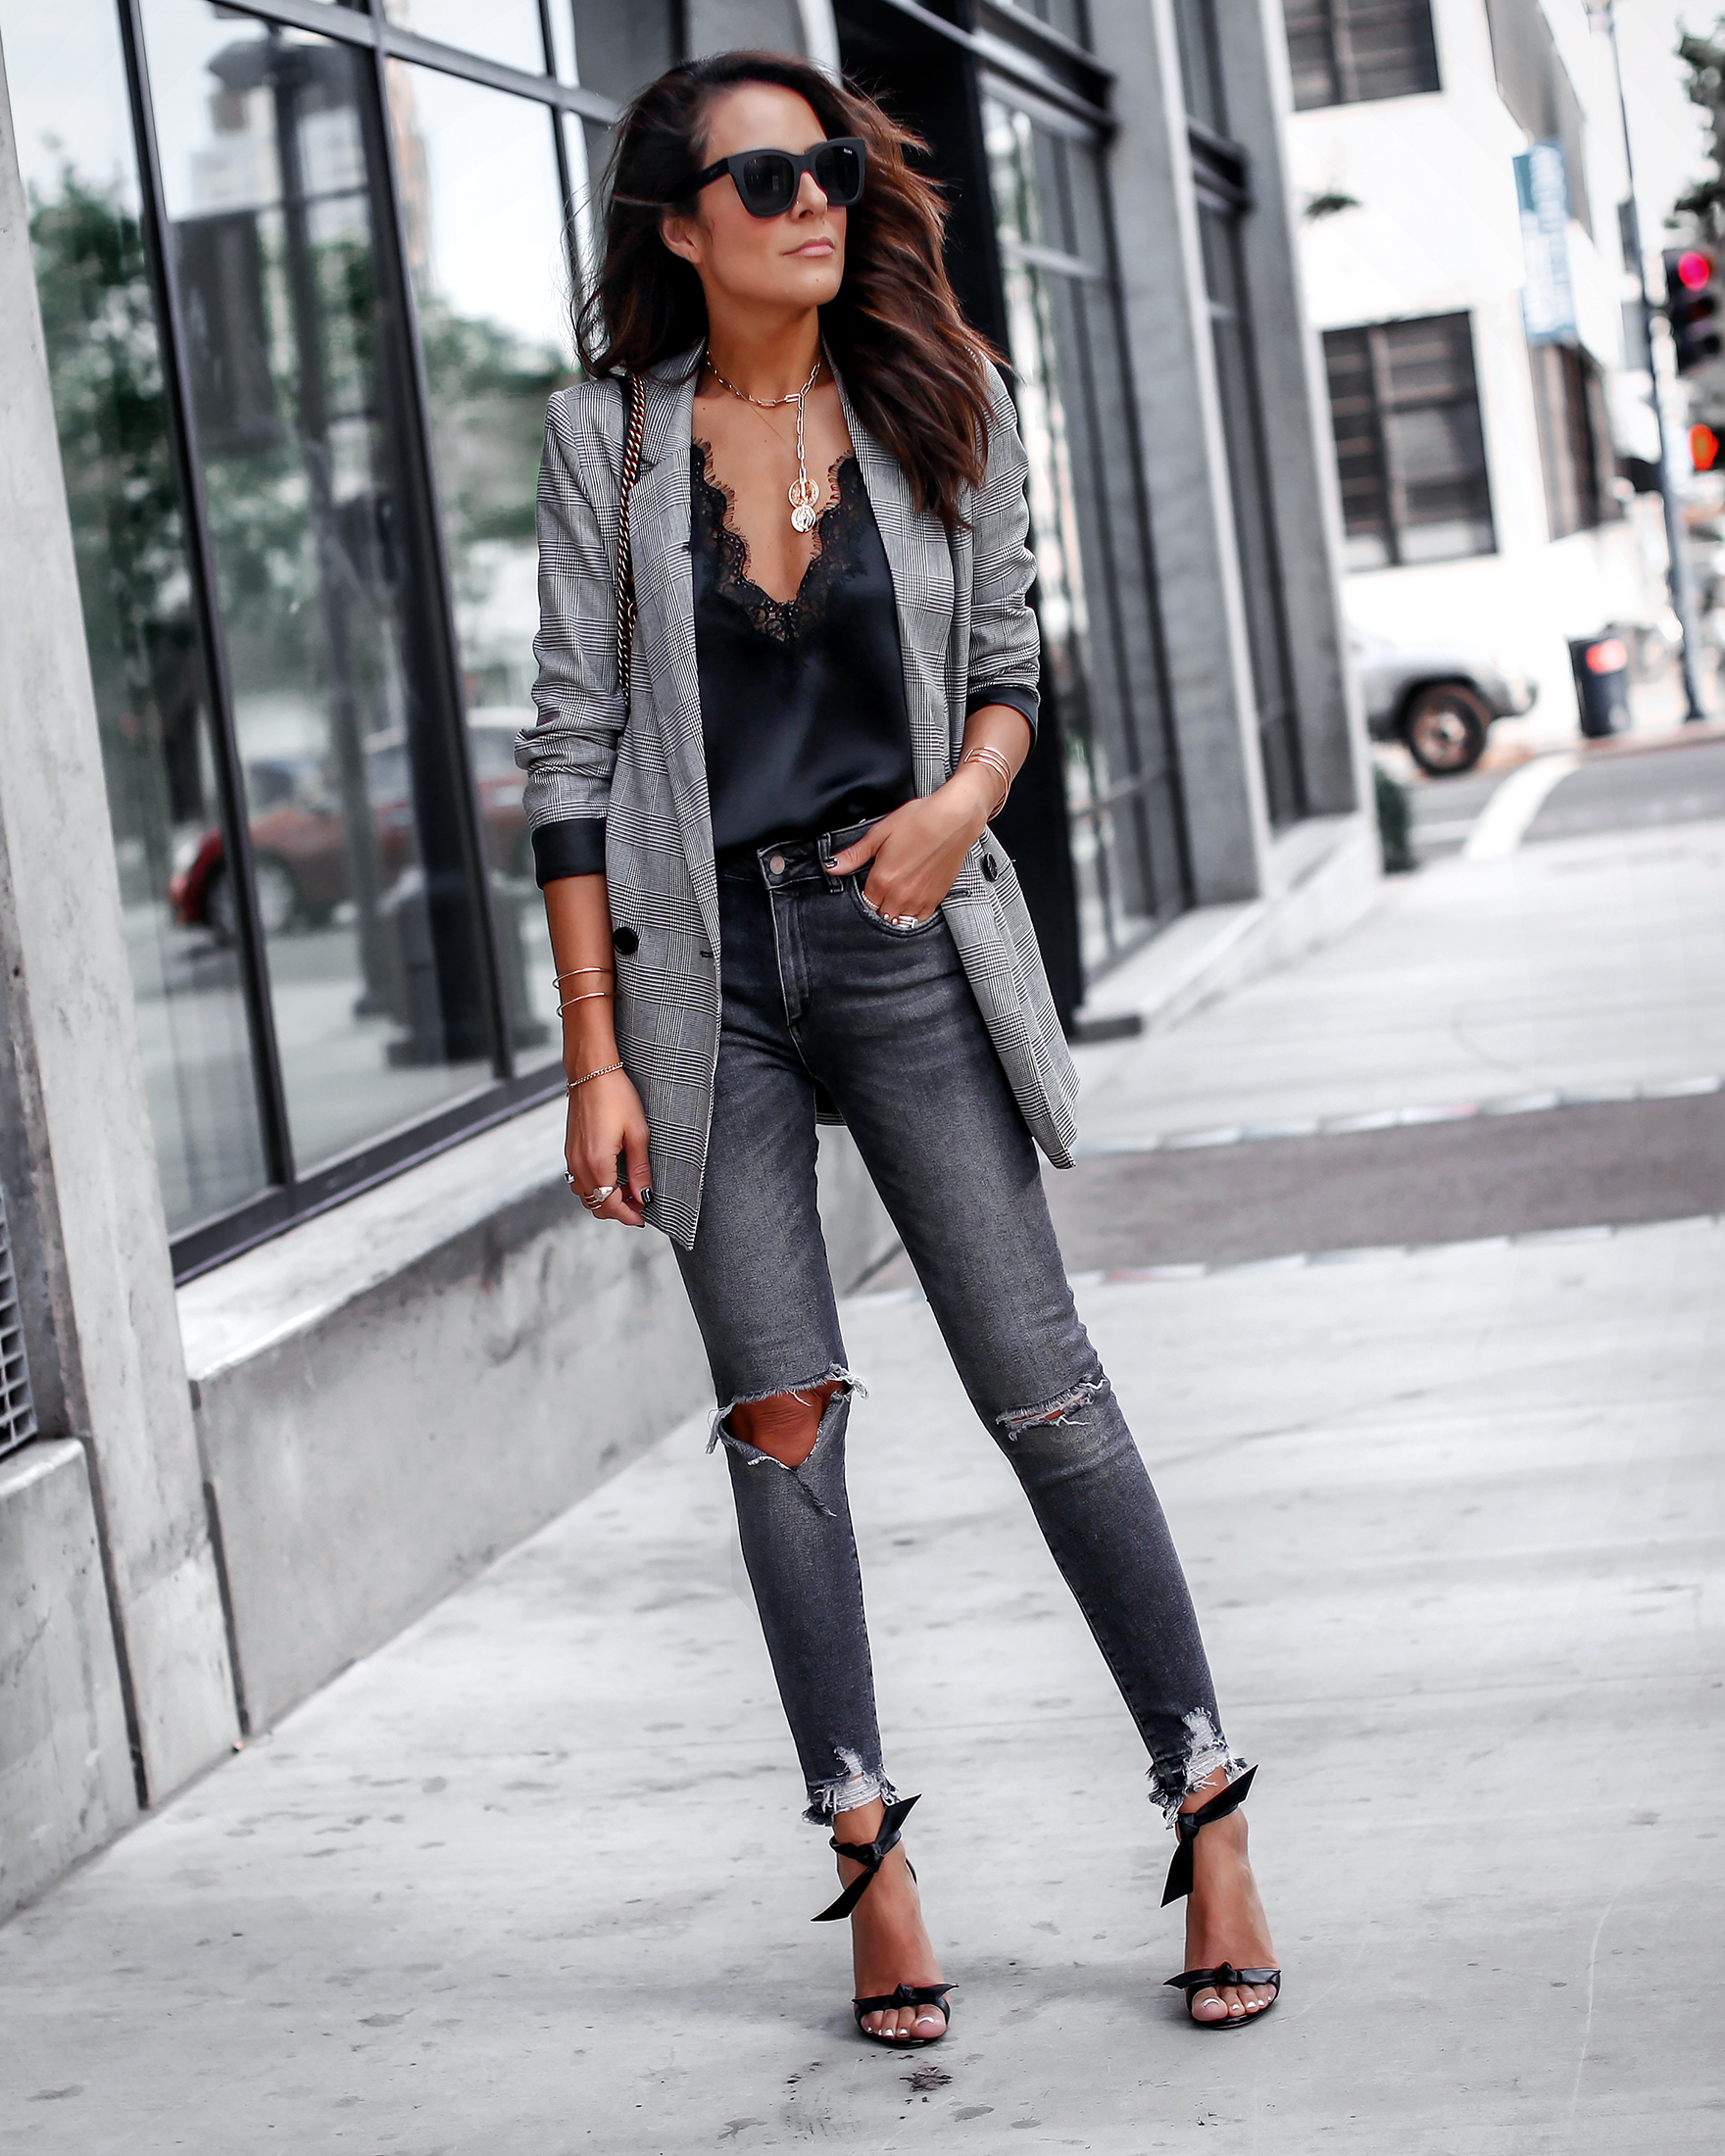 Plaid Blaze Cami NYC Ripped Denim Streetstyle Blogger Lucys Whims.jpg